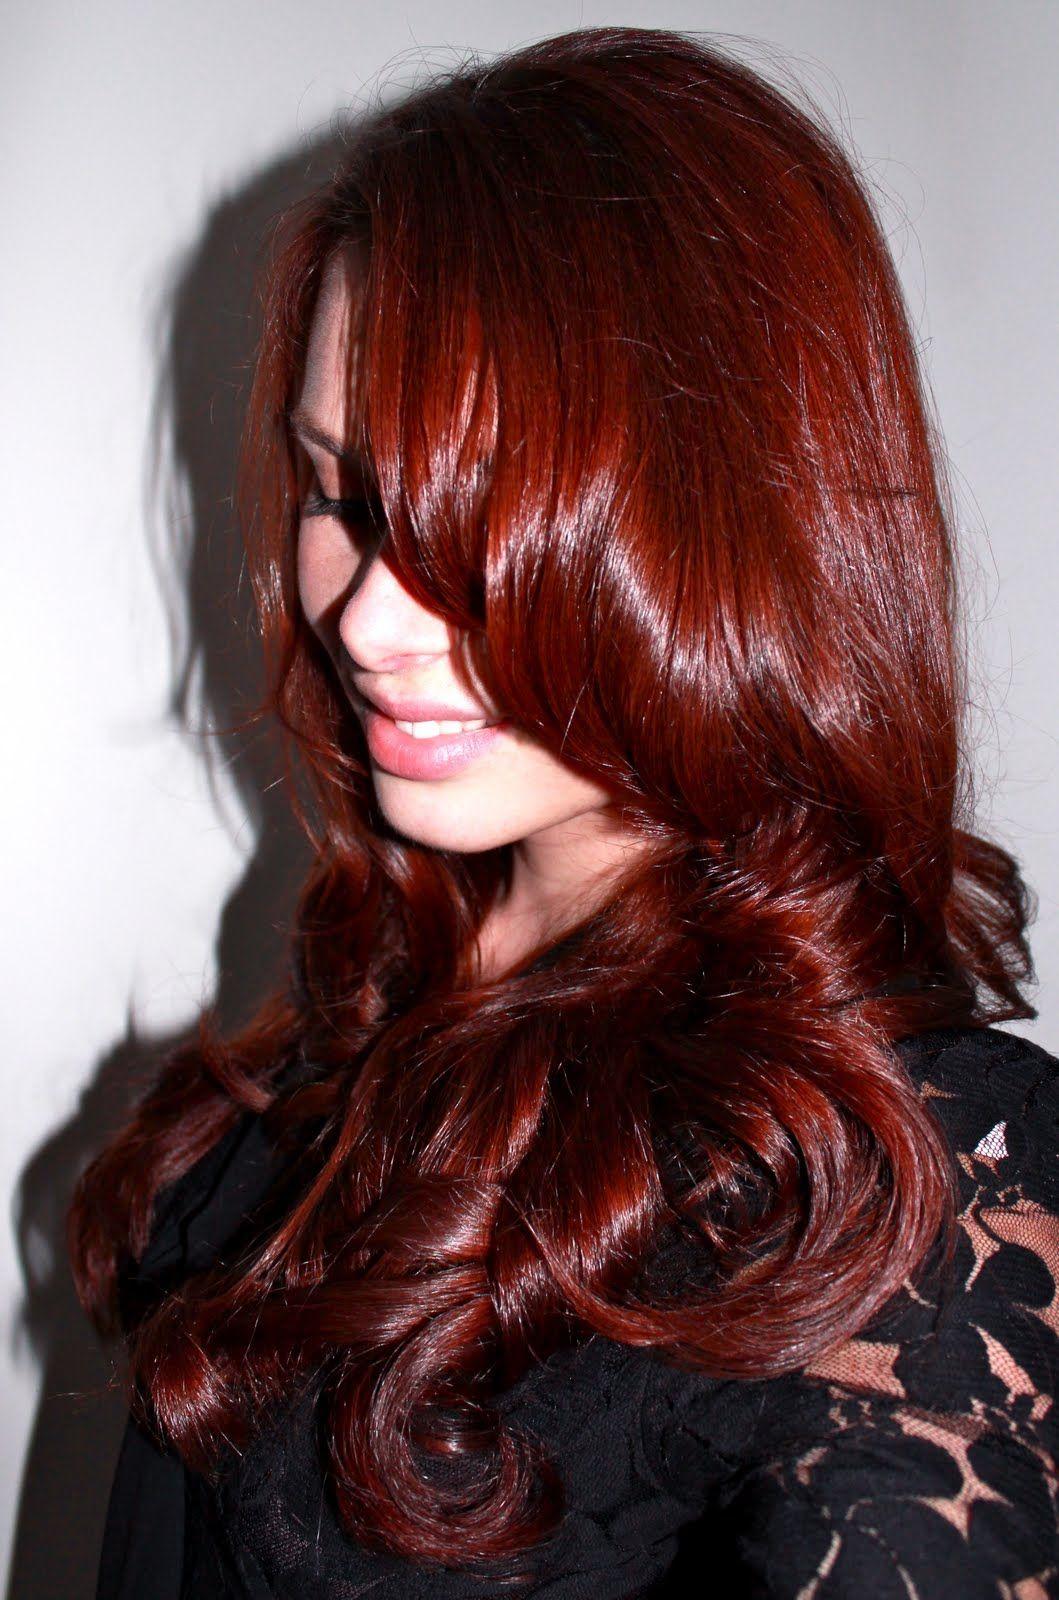 Filthygorgeousmakeup Natalya S Got The Most Gorgeous Red Long Hair Ever Long Hair Styles Hair Short Asymmetrical Haircut